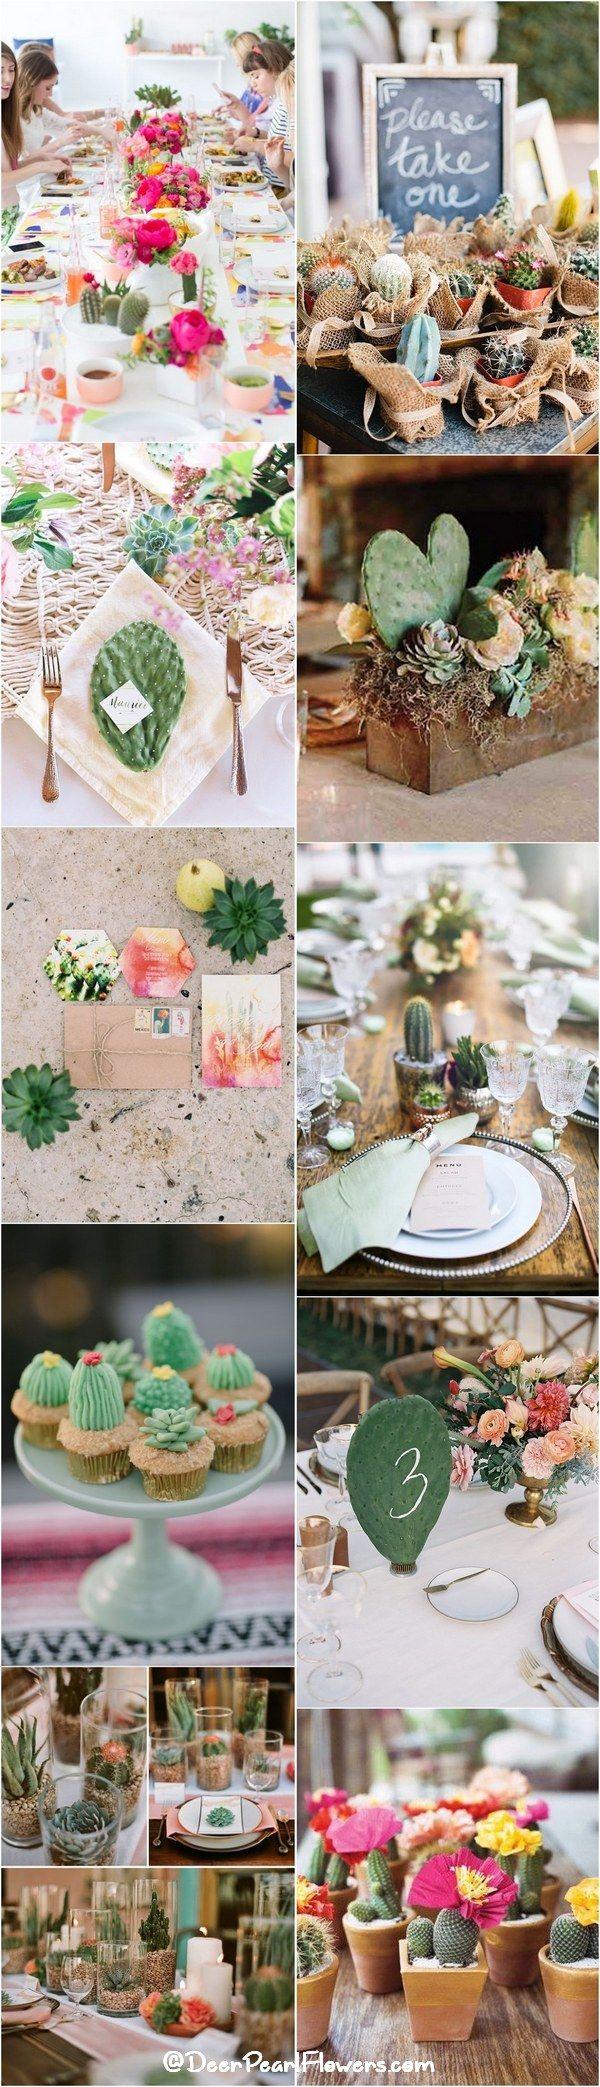 rustic wedding ideas - cactus wedding ideas and themes / http://www.deerpearlflowers.com/cactus-wedding-ideas/